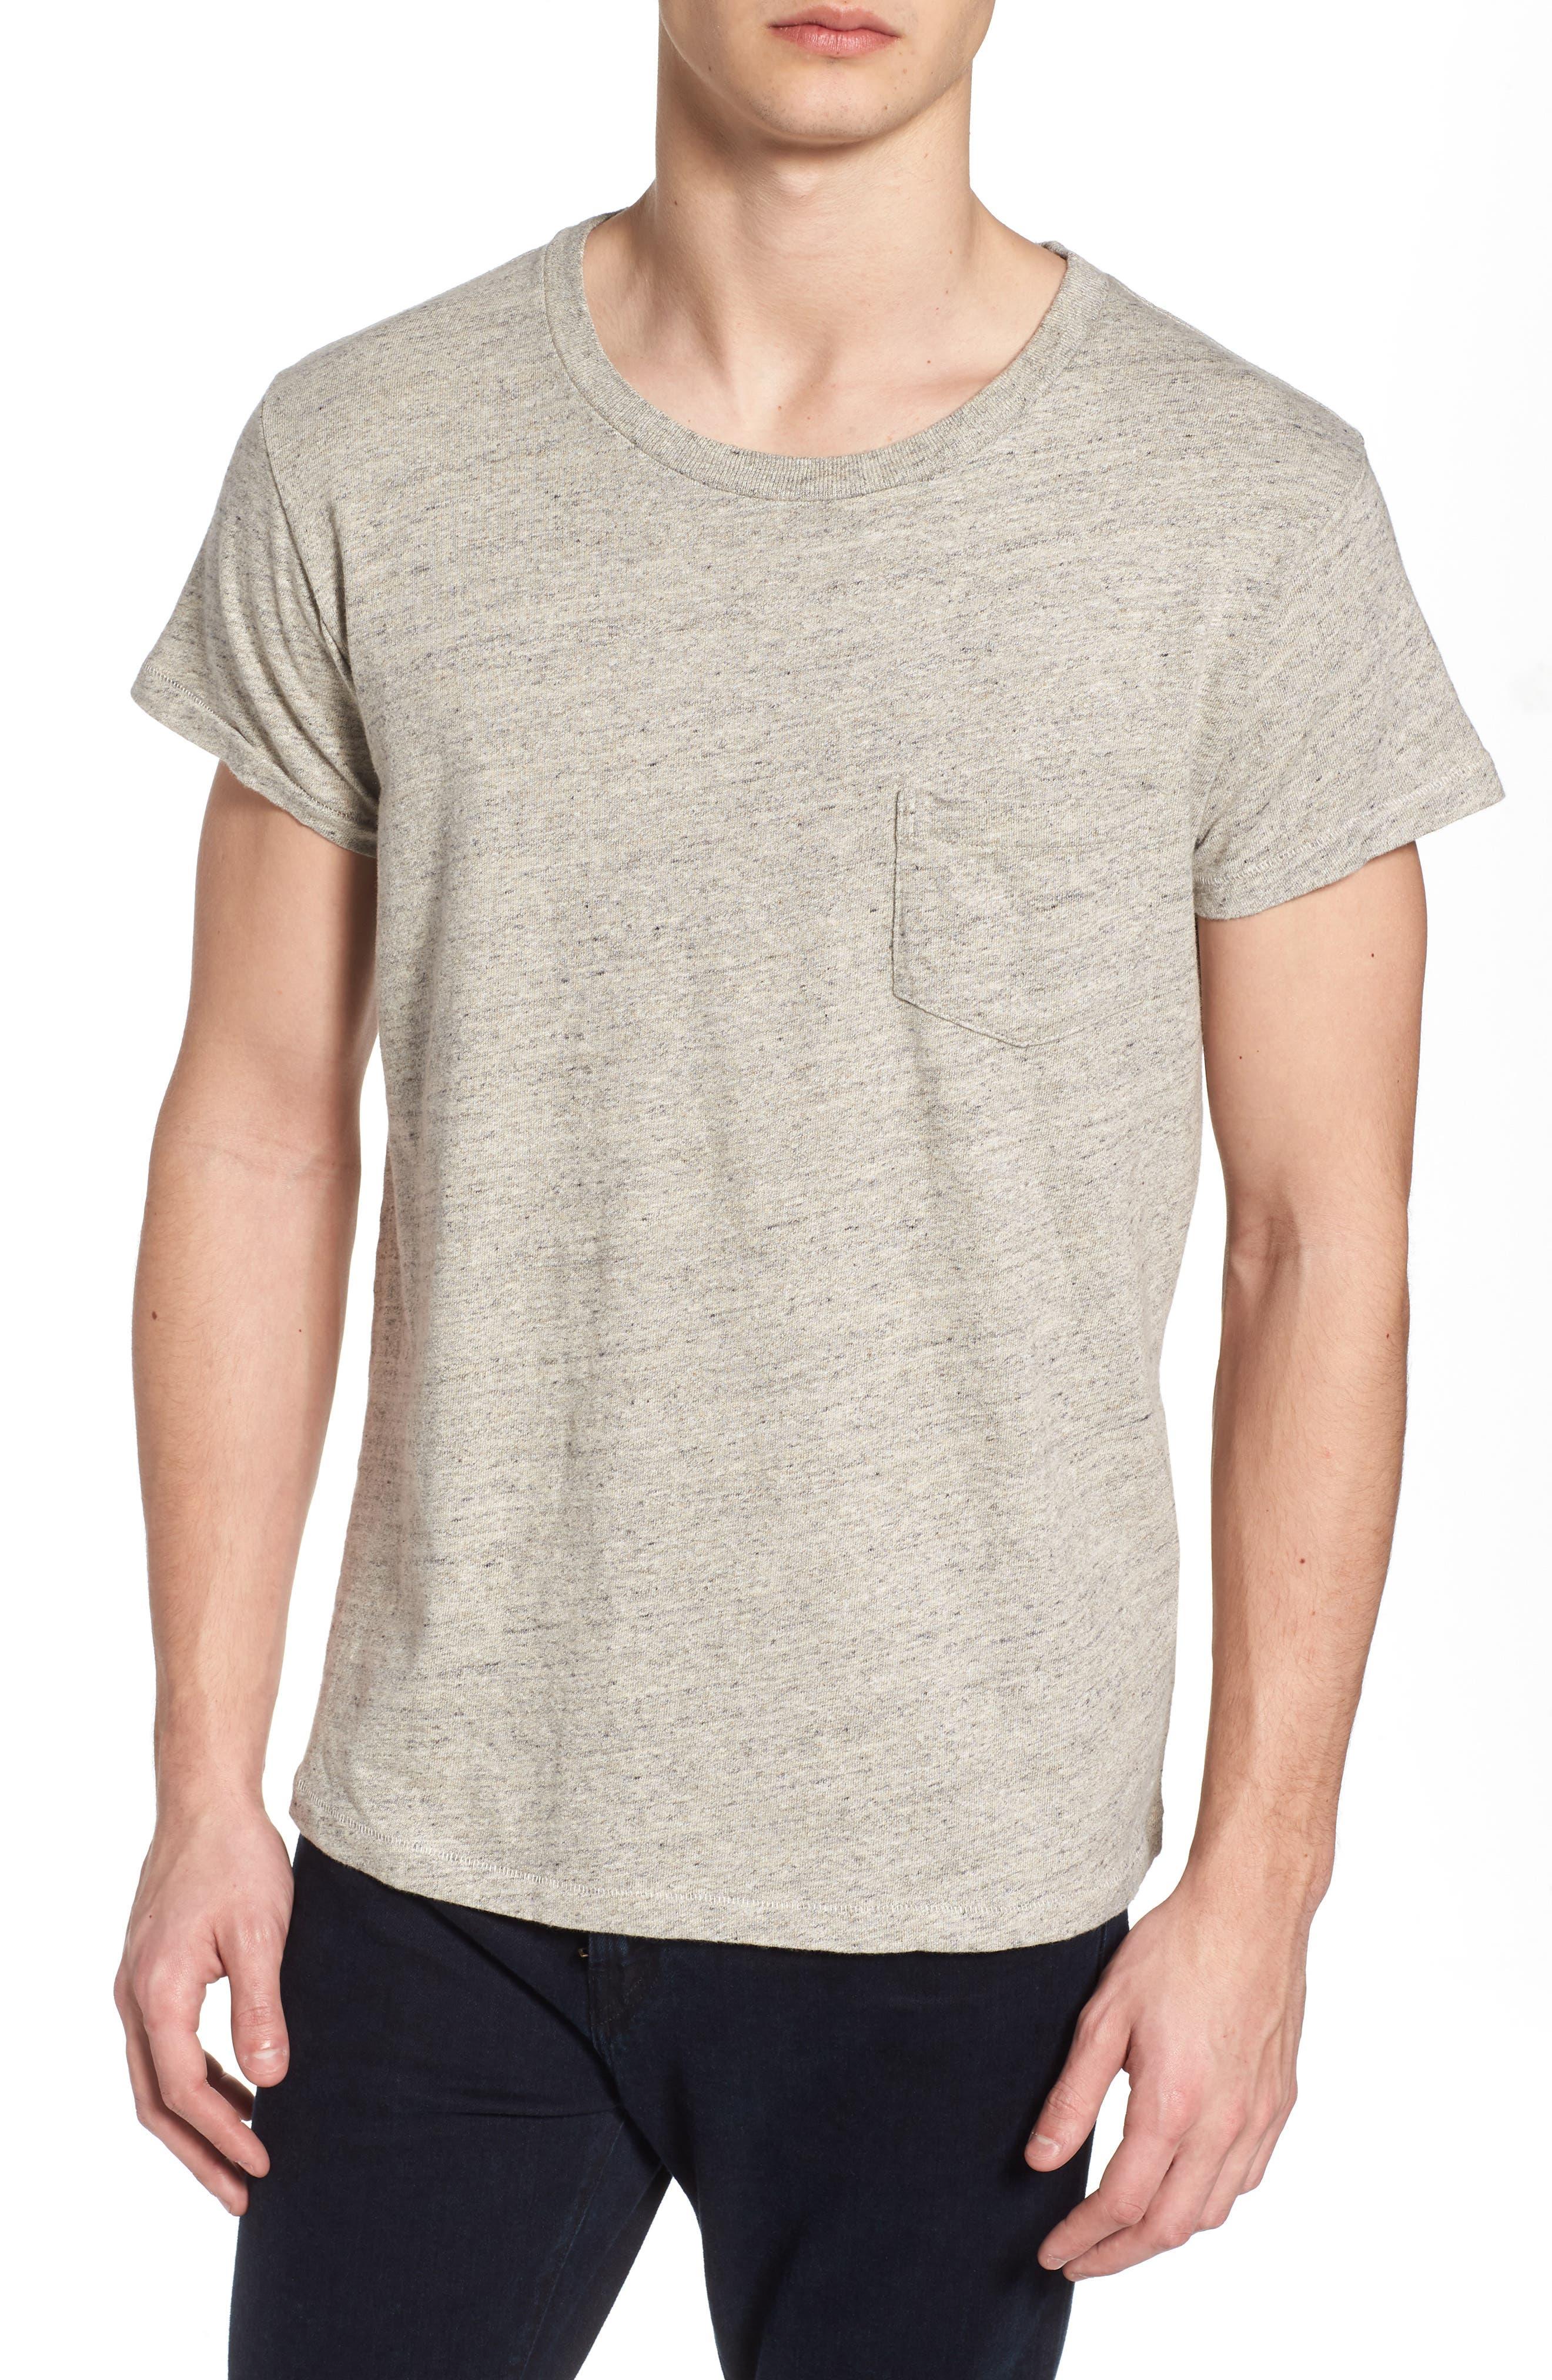 Levi's Vintage Clothing 1950s Sportswear Pocket T-Shirt,                             Main thumbnail 1, color,                             Grey